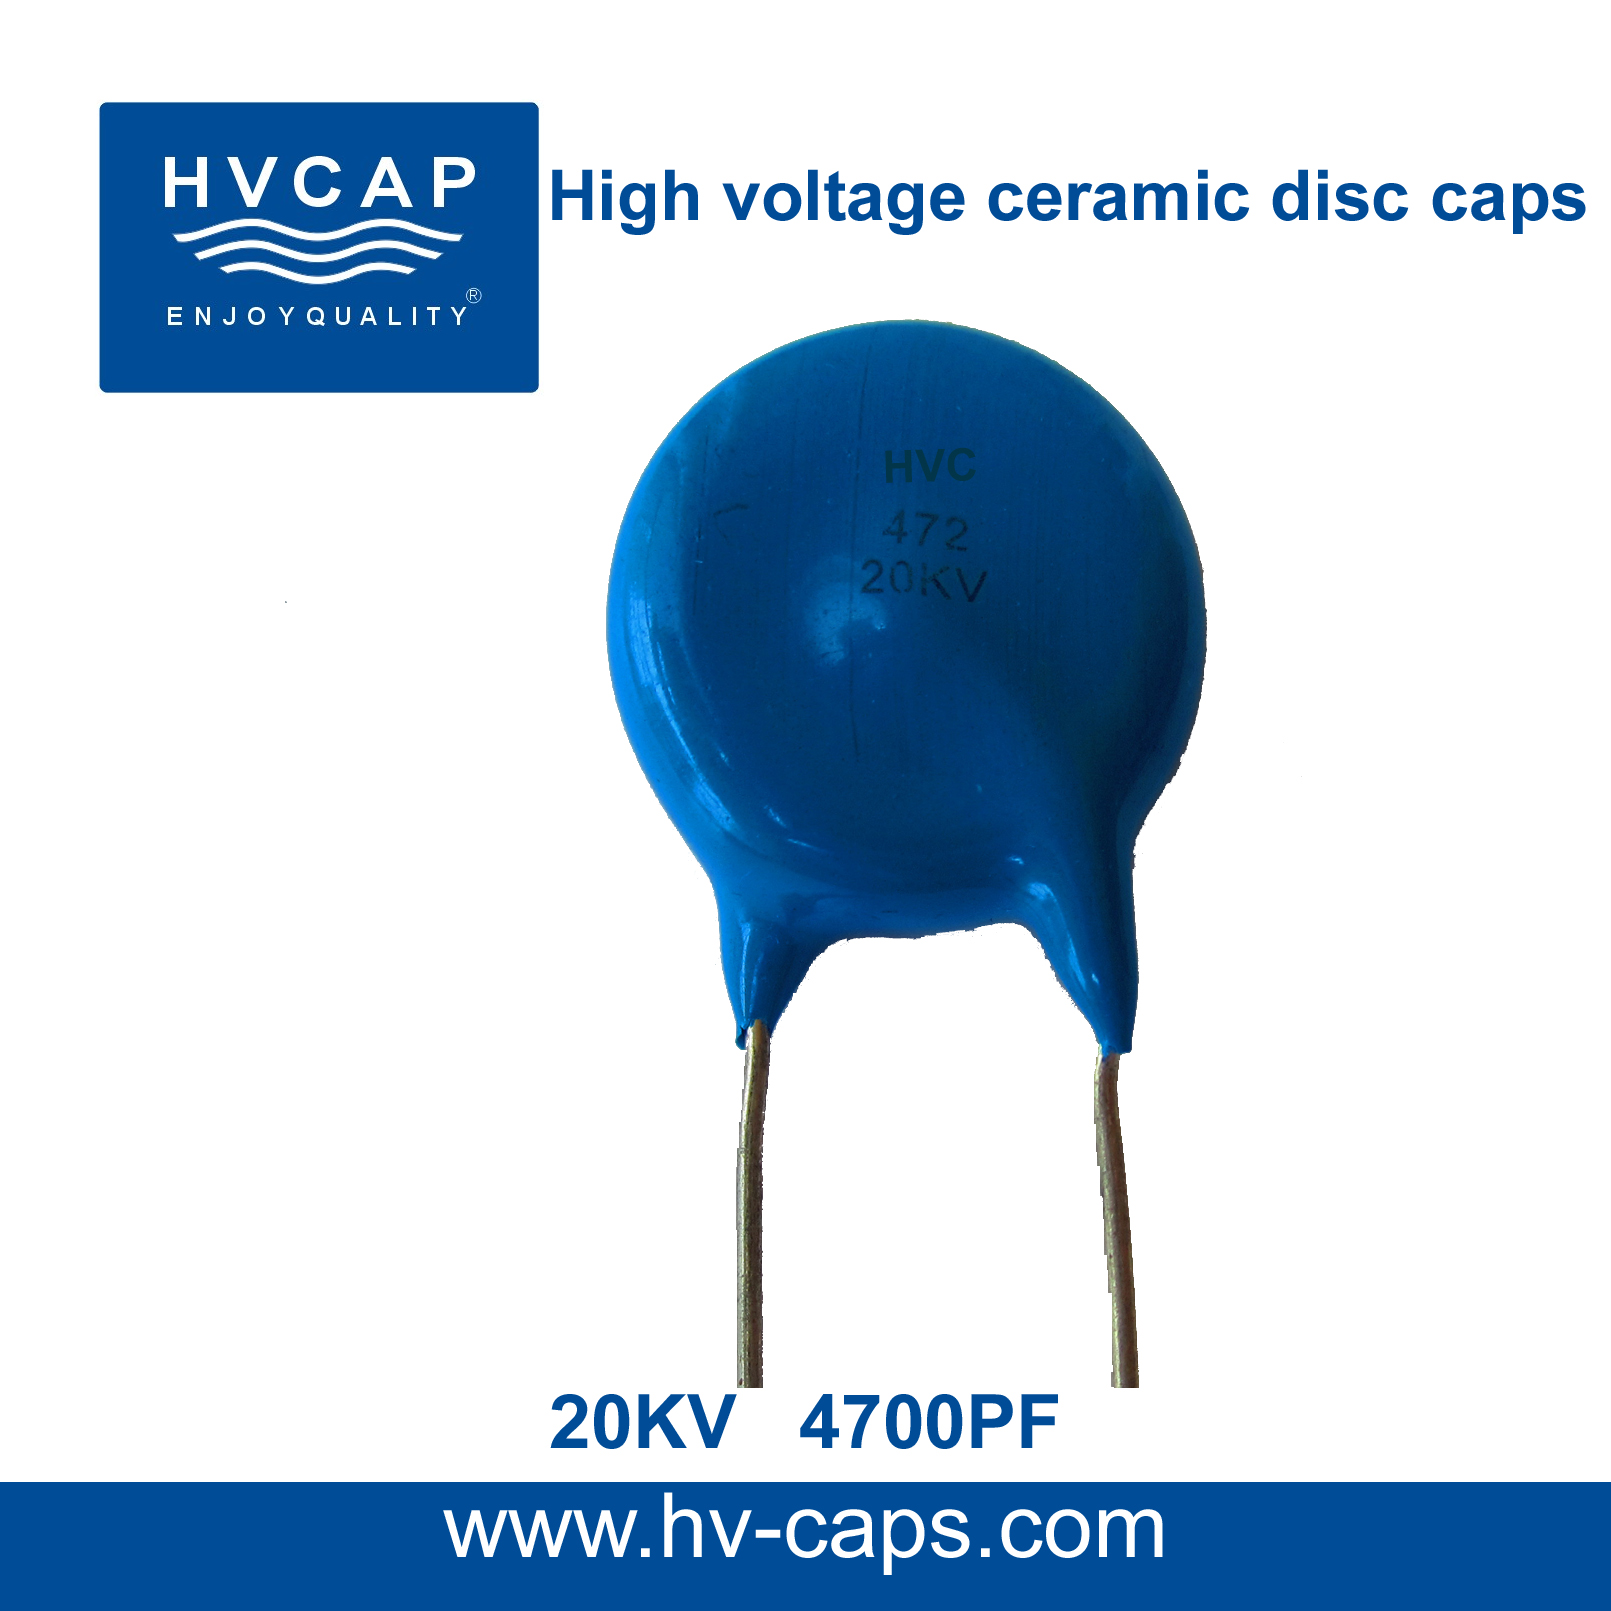 Hoë Spanning Keramiese Skyfkondensator 20KV 4700PF (20KV 472M)